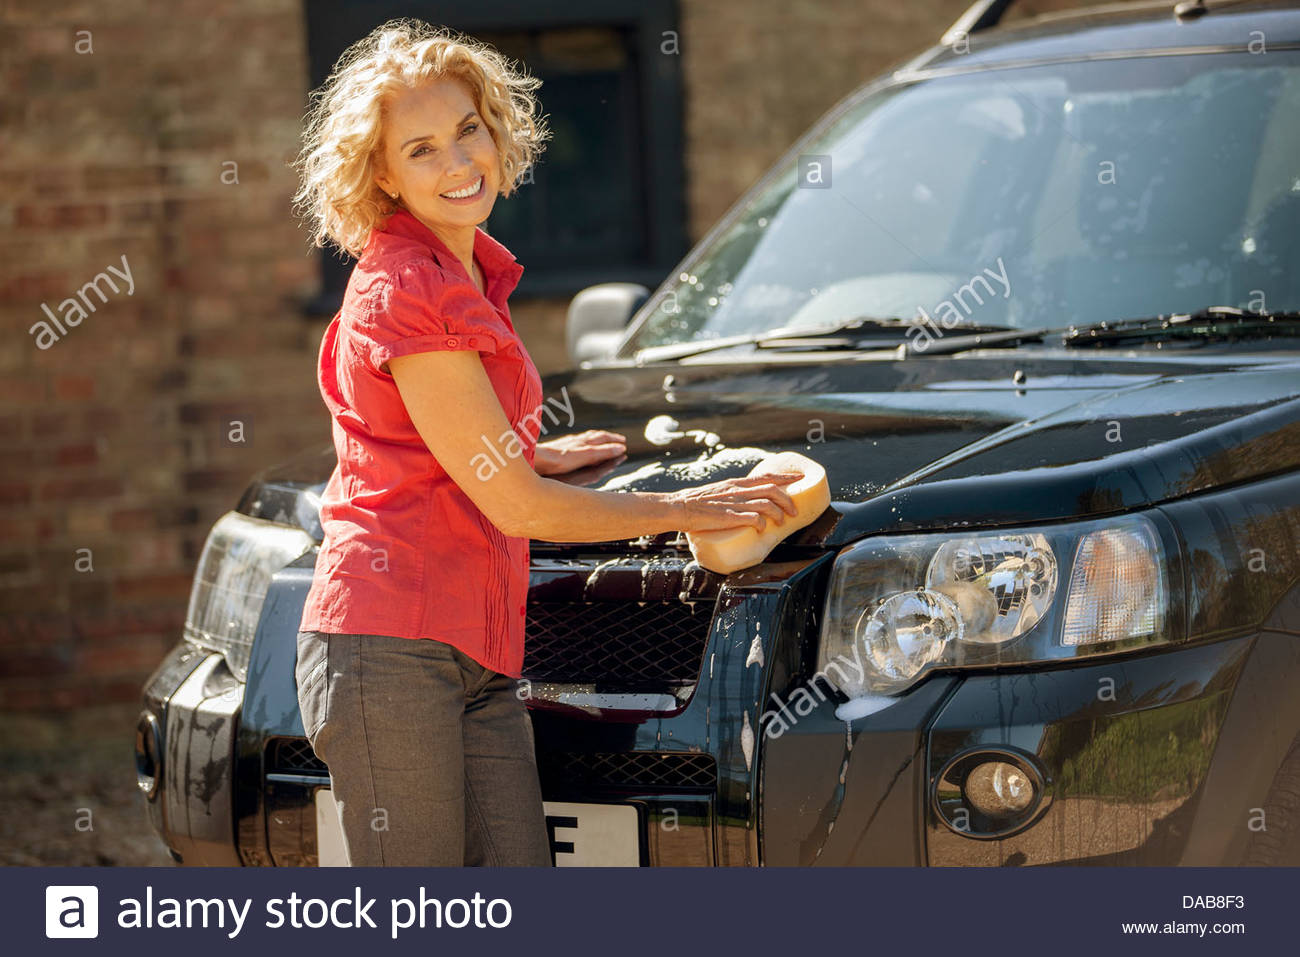 A mature woman washing a four wheel drive car - Stock Image